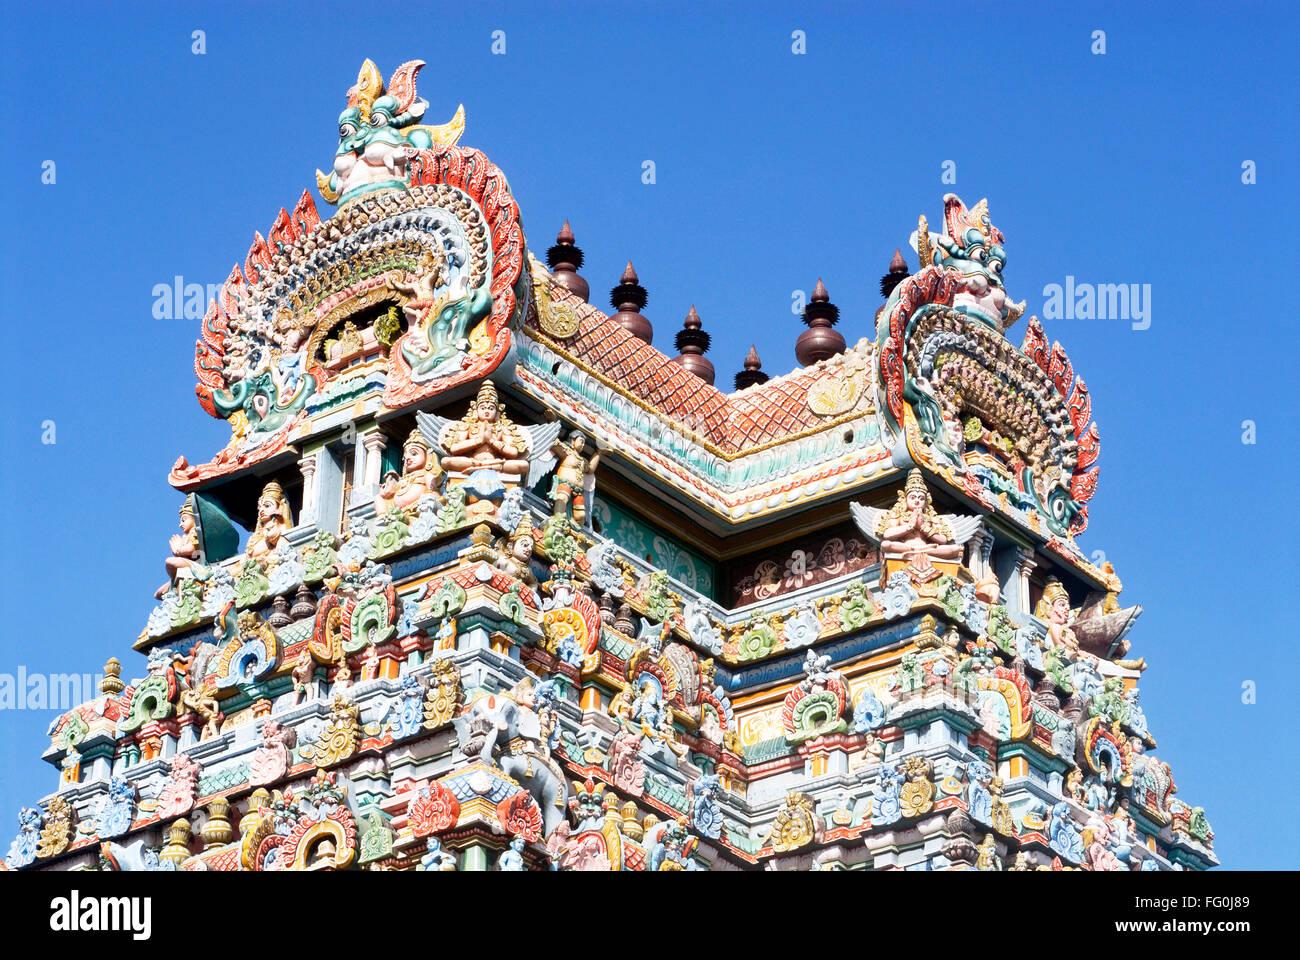 Gopuram richly decorated stucco figures impressive gateway Sri Ranganathswami temple Srirangam Tiruchirapalli Tamil Stock Photo